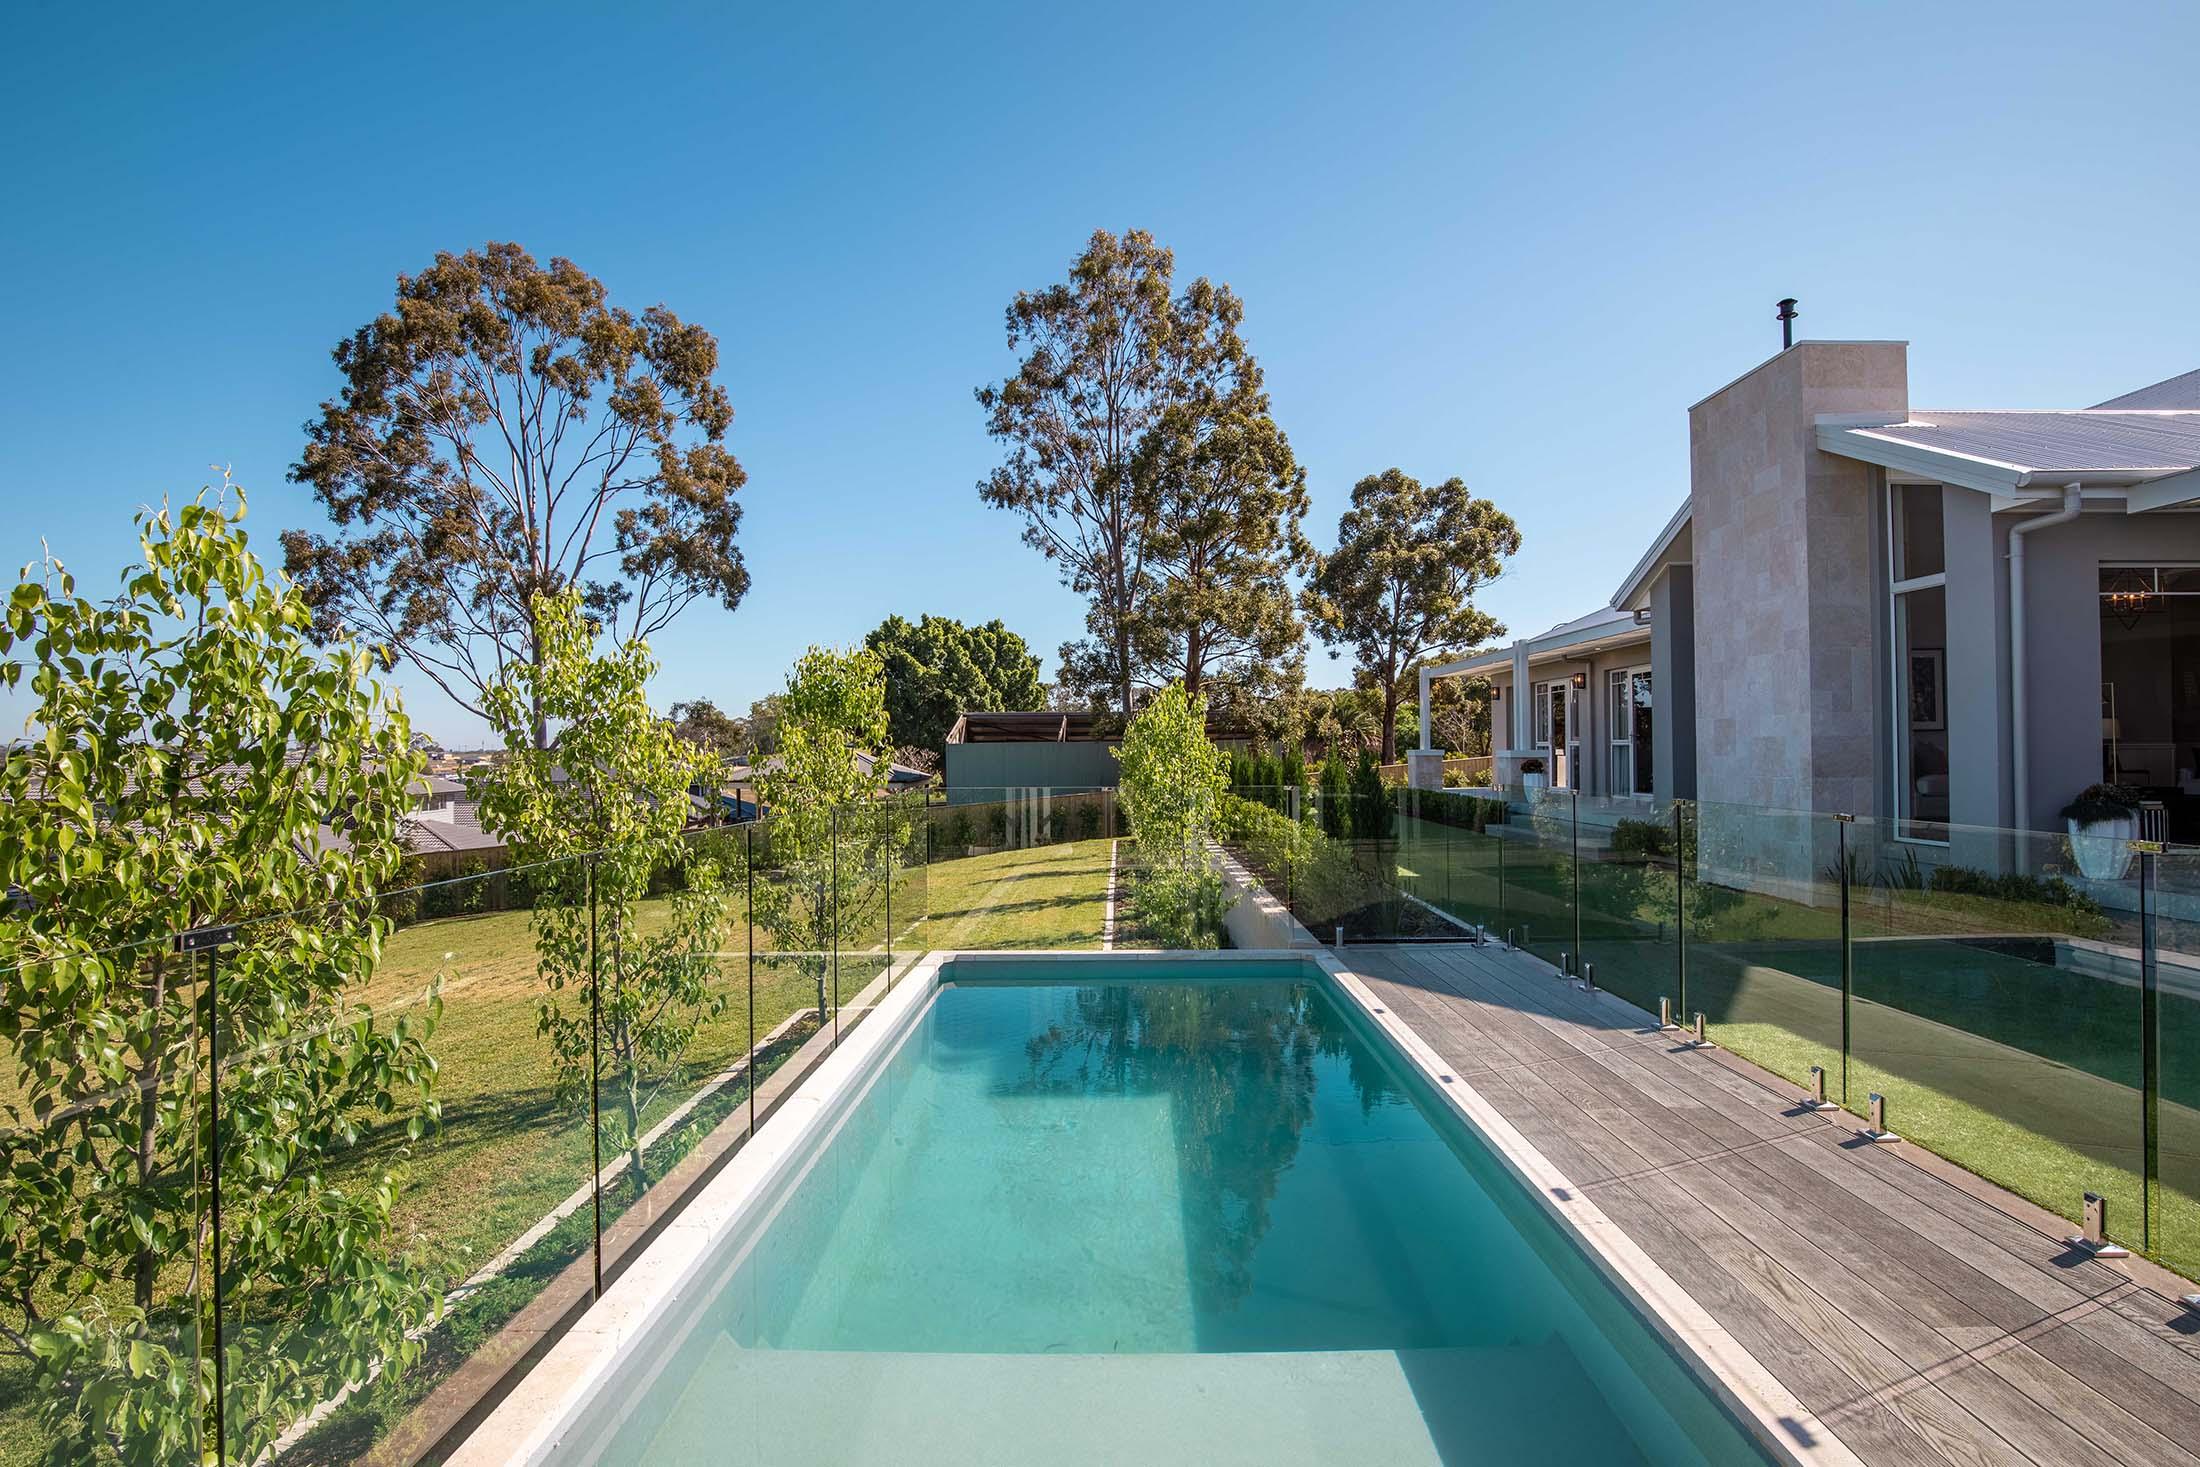 Plungie Max 20ft x 10ft concrete swimming pool in Blue Granite